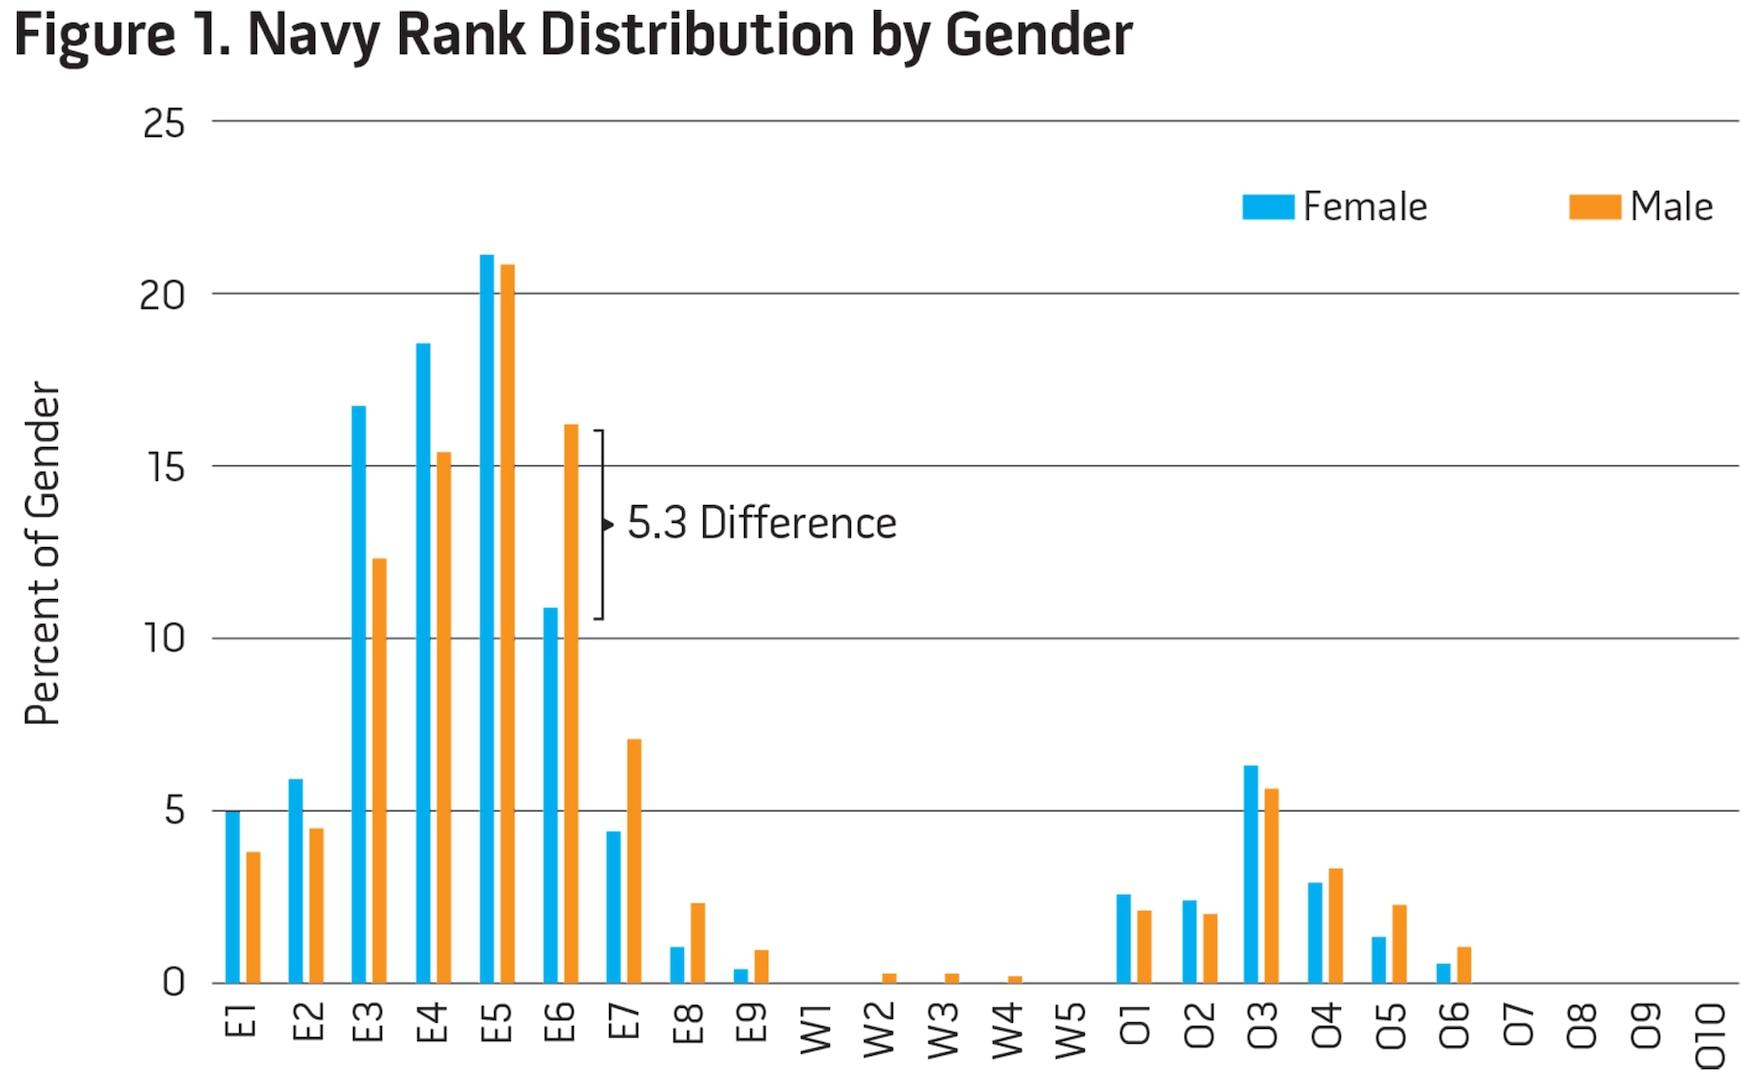 Figure 1. Navy Rank Distribution by Gender